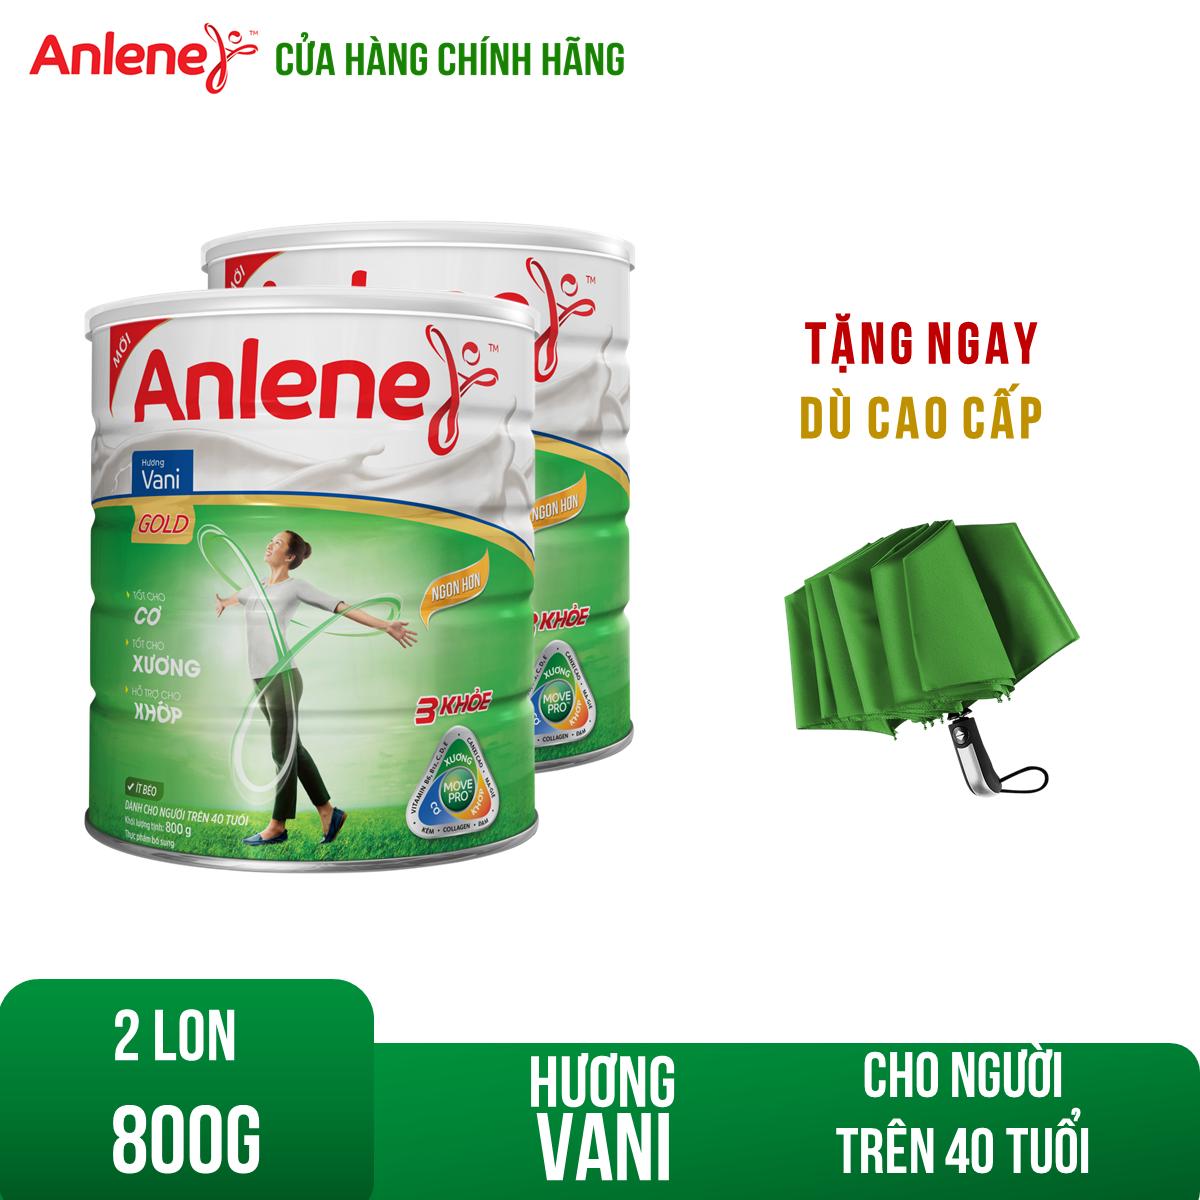 Bộ 2 Lon sữa bột Anlene Gold Movepro Vanilla 800g Tặng Dù cao cấp